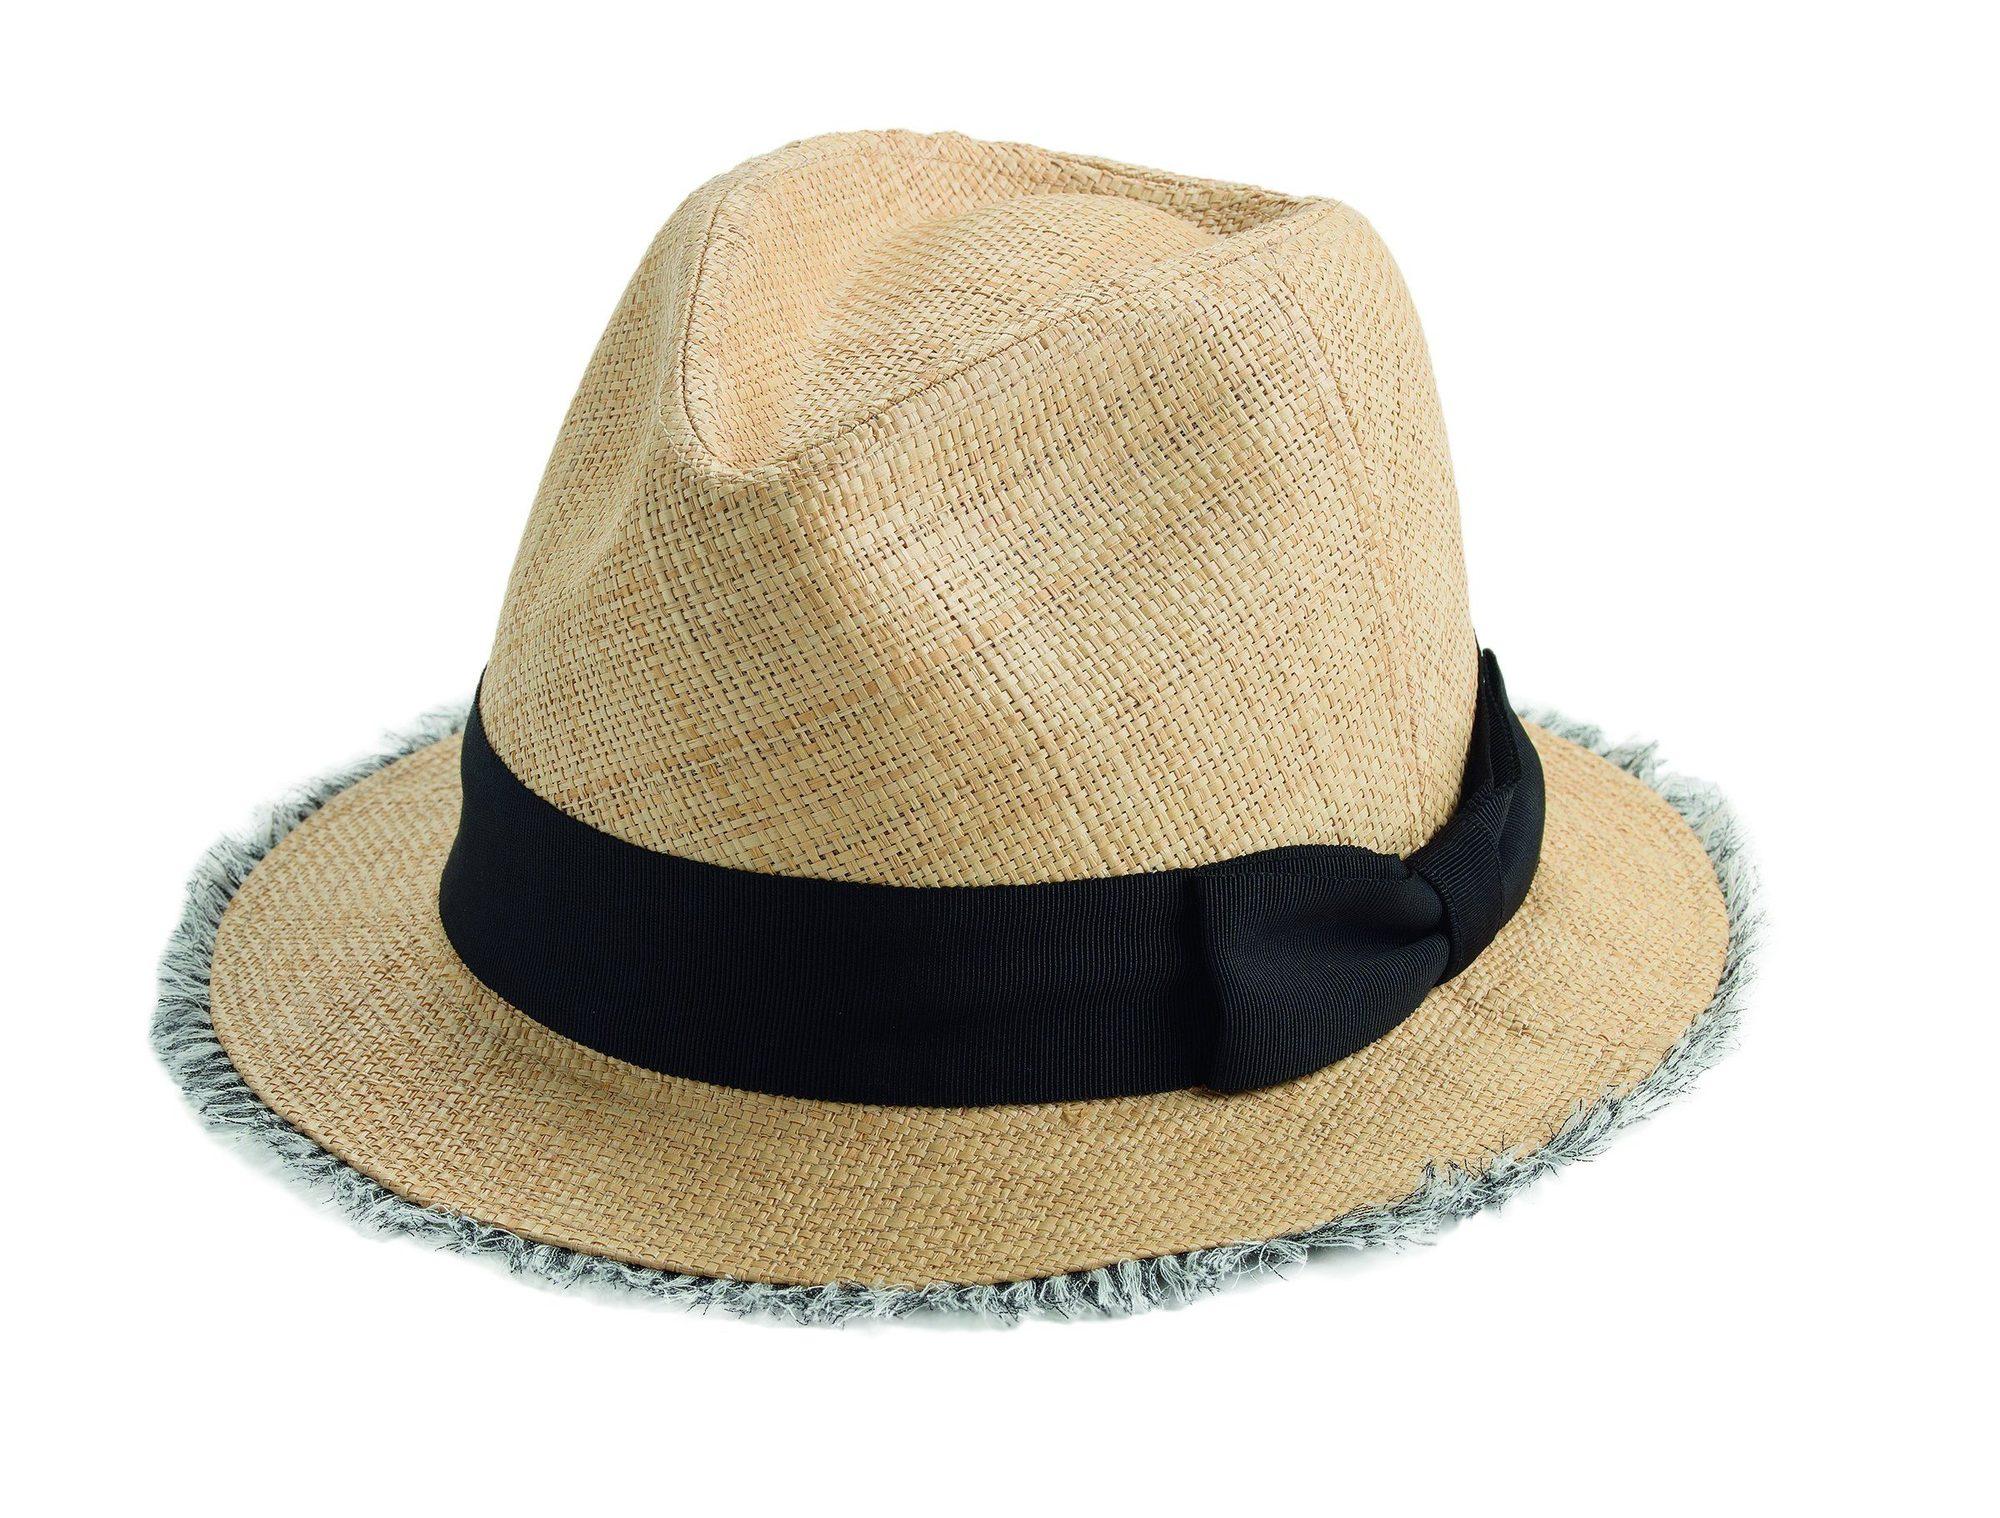 hats-women-s-woven-raffia-fray-edge-panama-fedora-with-ribbon-bow-ebh9890-1_2000x.jpg